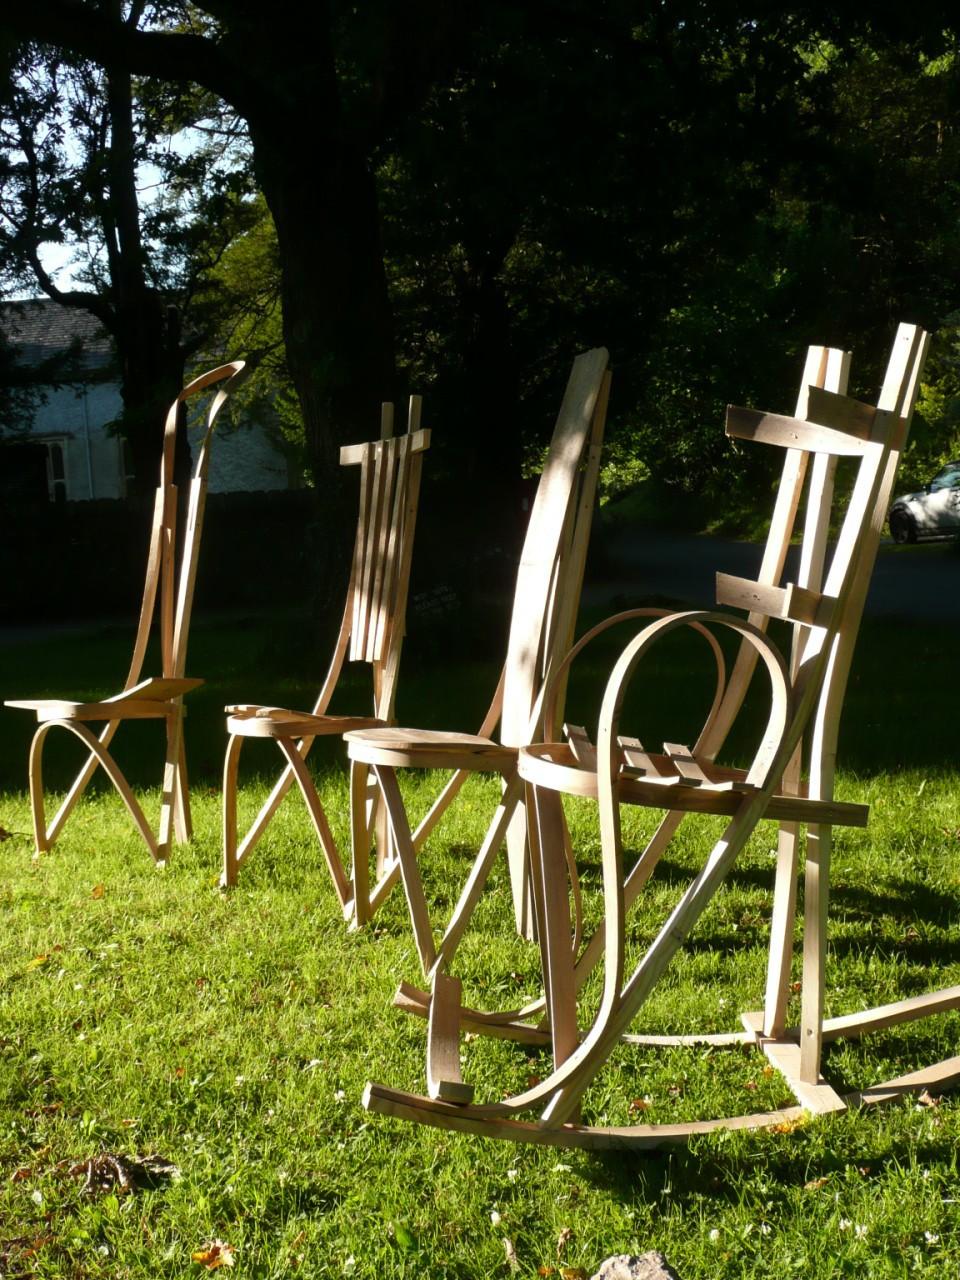 steambending, steambent, chair, furniture, woodwork, sunshine